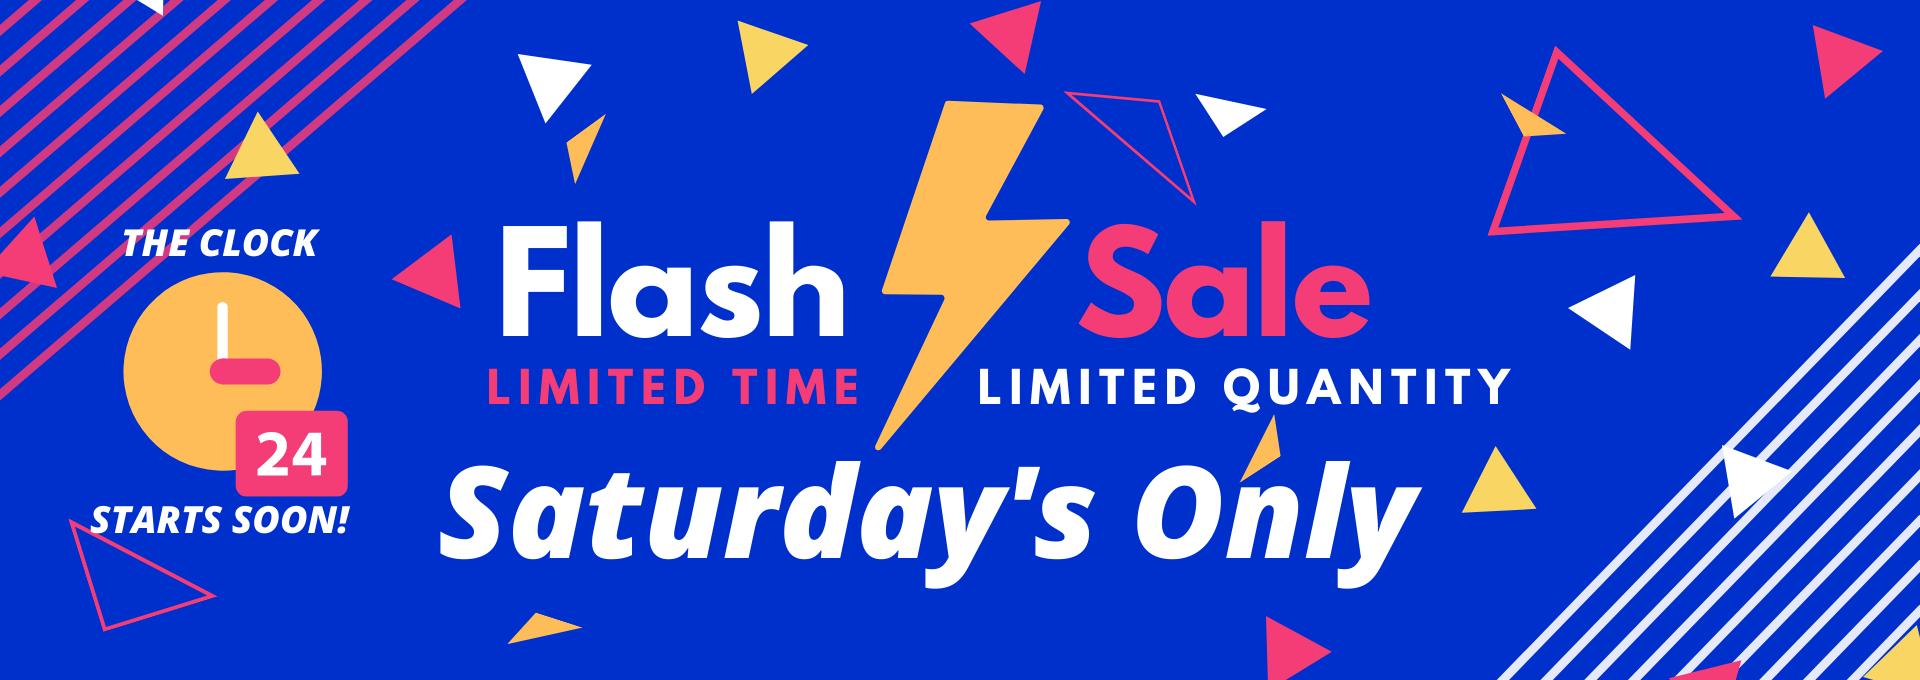 Flash Sale Saturday Is Coming Soon!